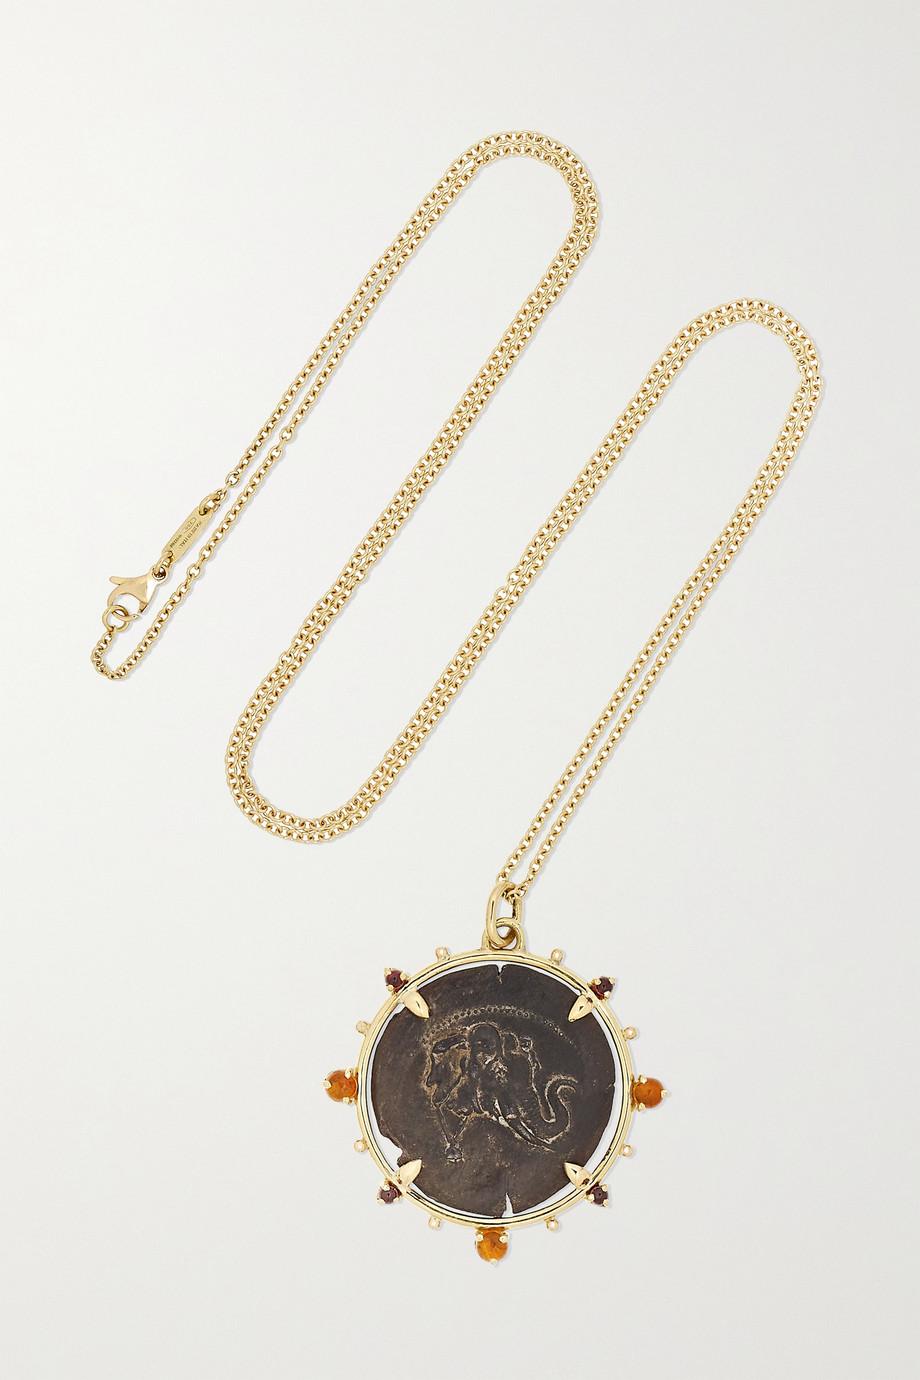 Dubini Demetrios 18-karat gold, garnet and citrine necklace